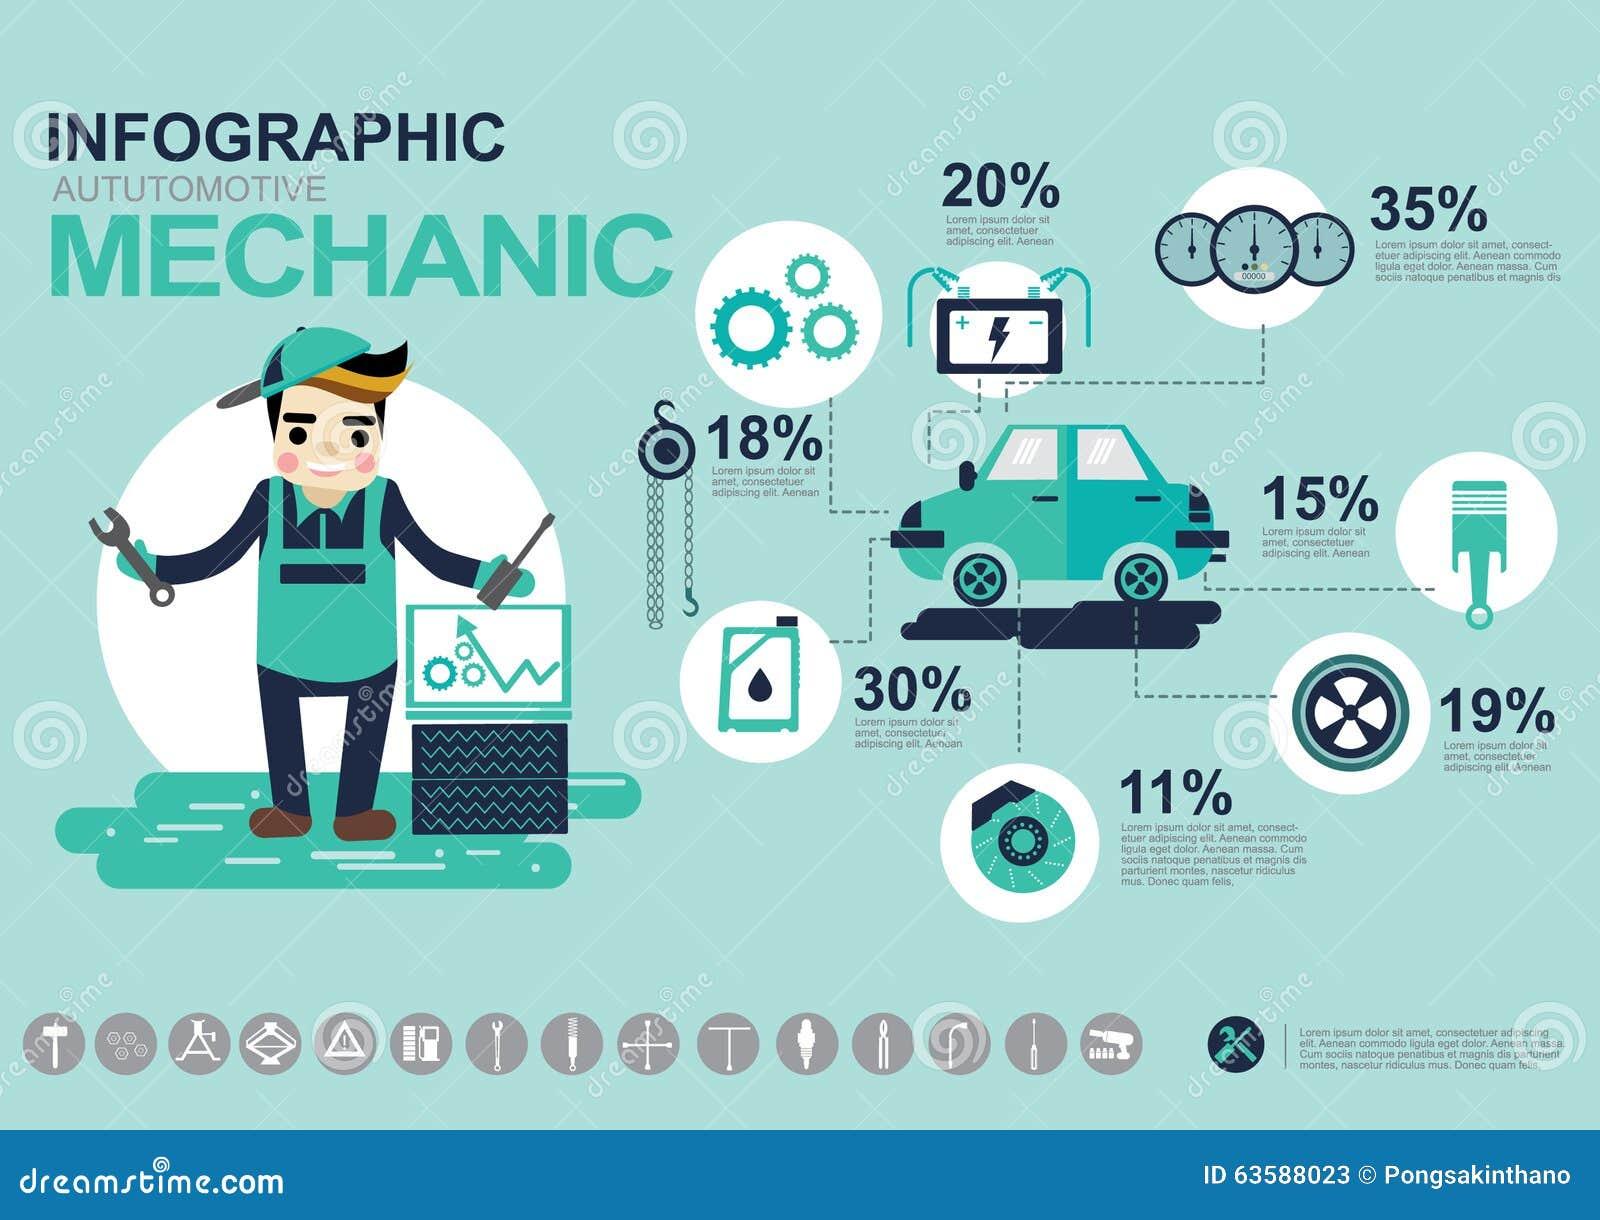 Infographic Automotive Mechanic Stock Vector